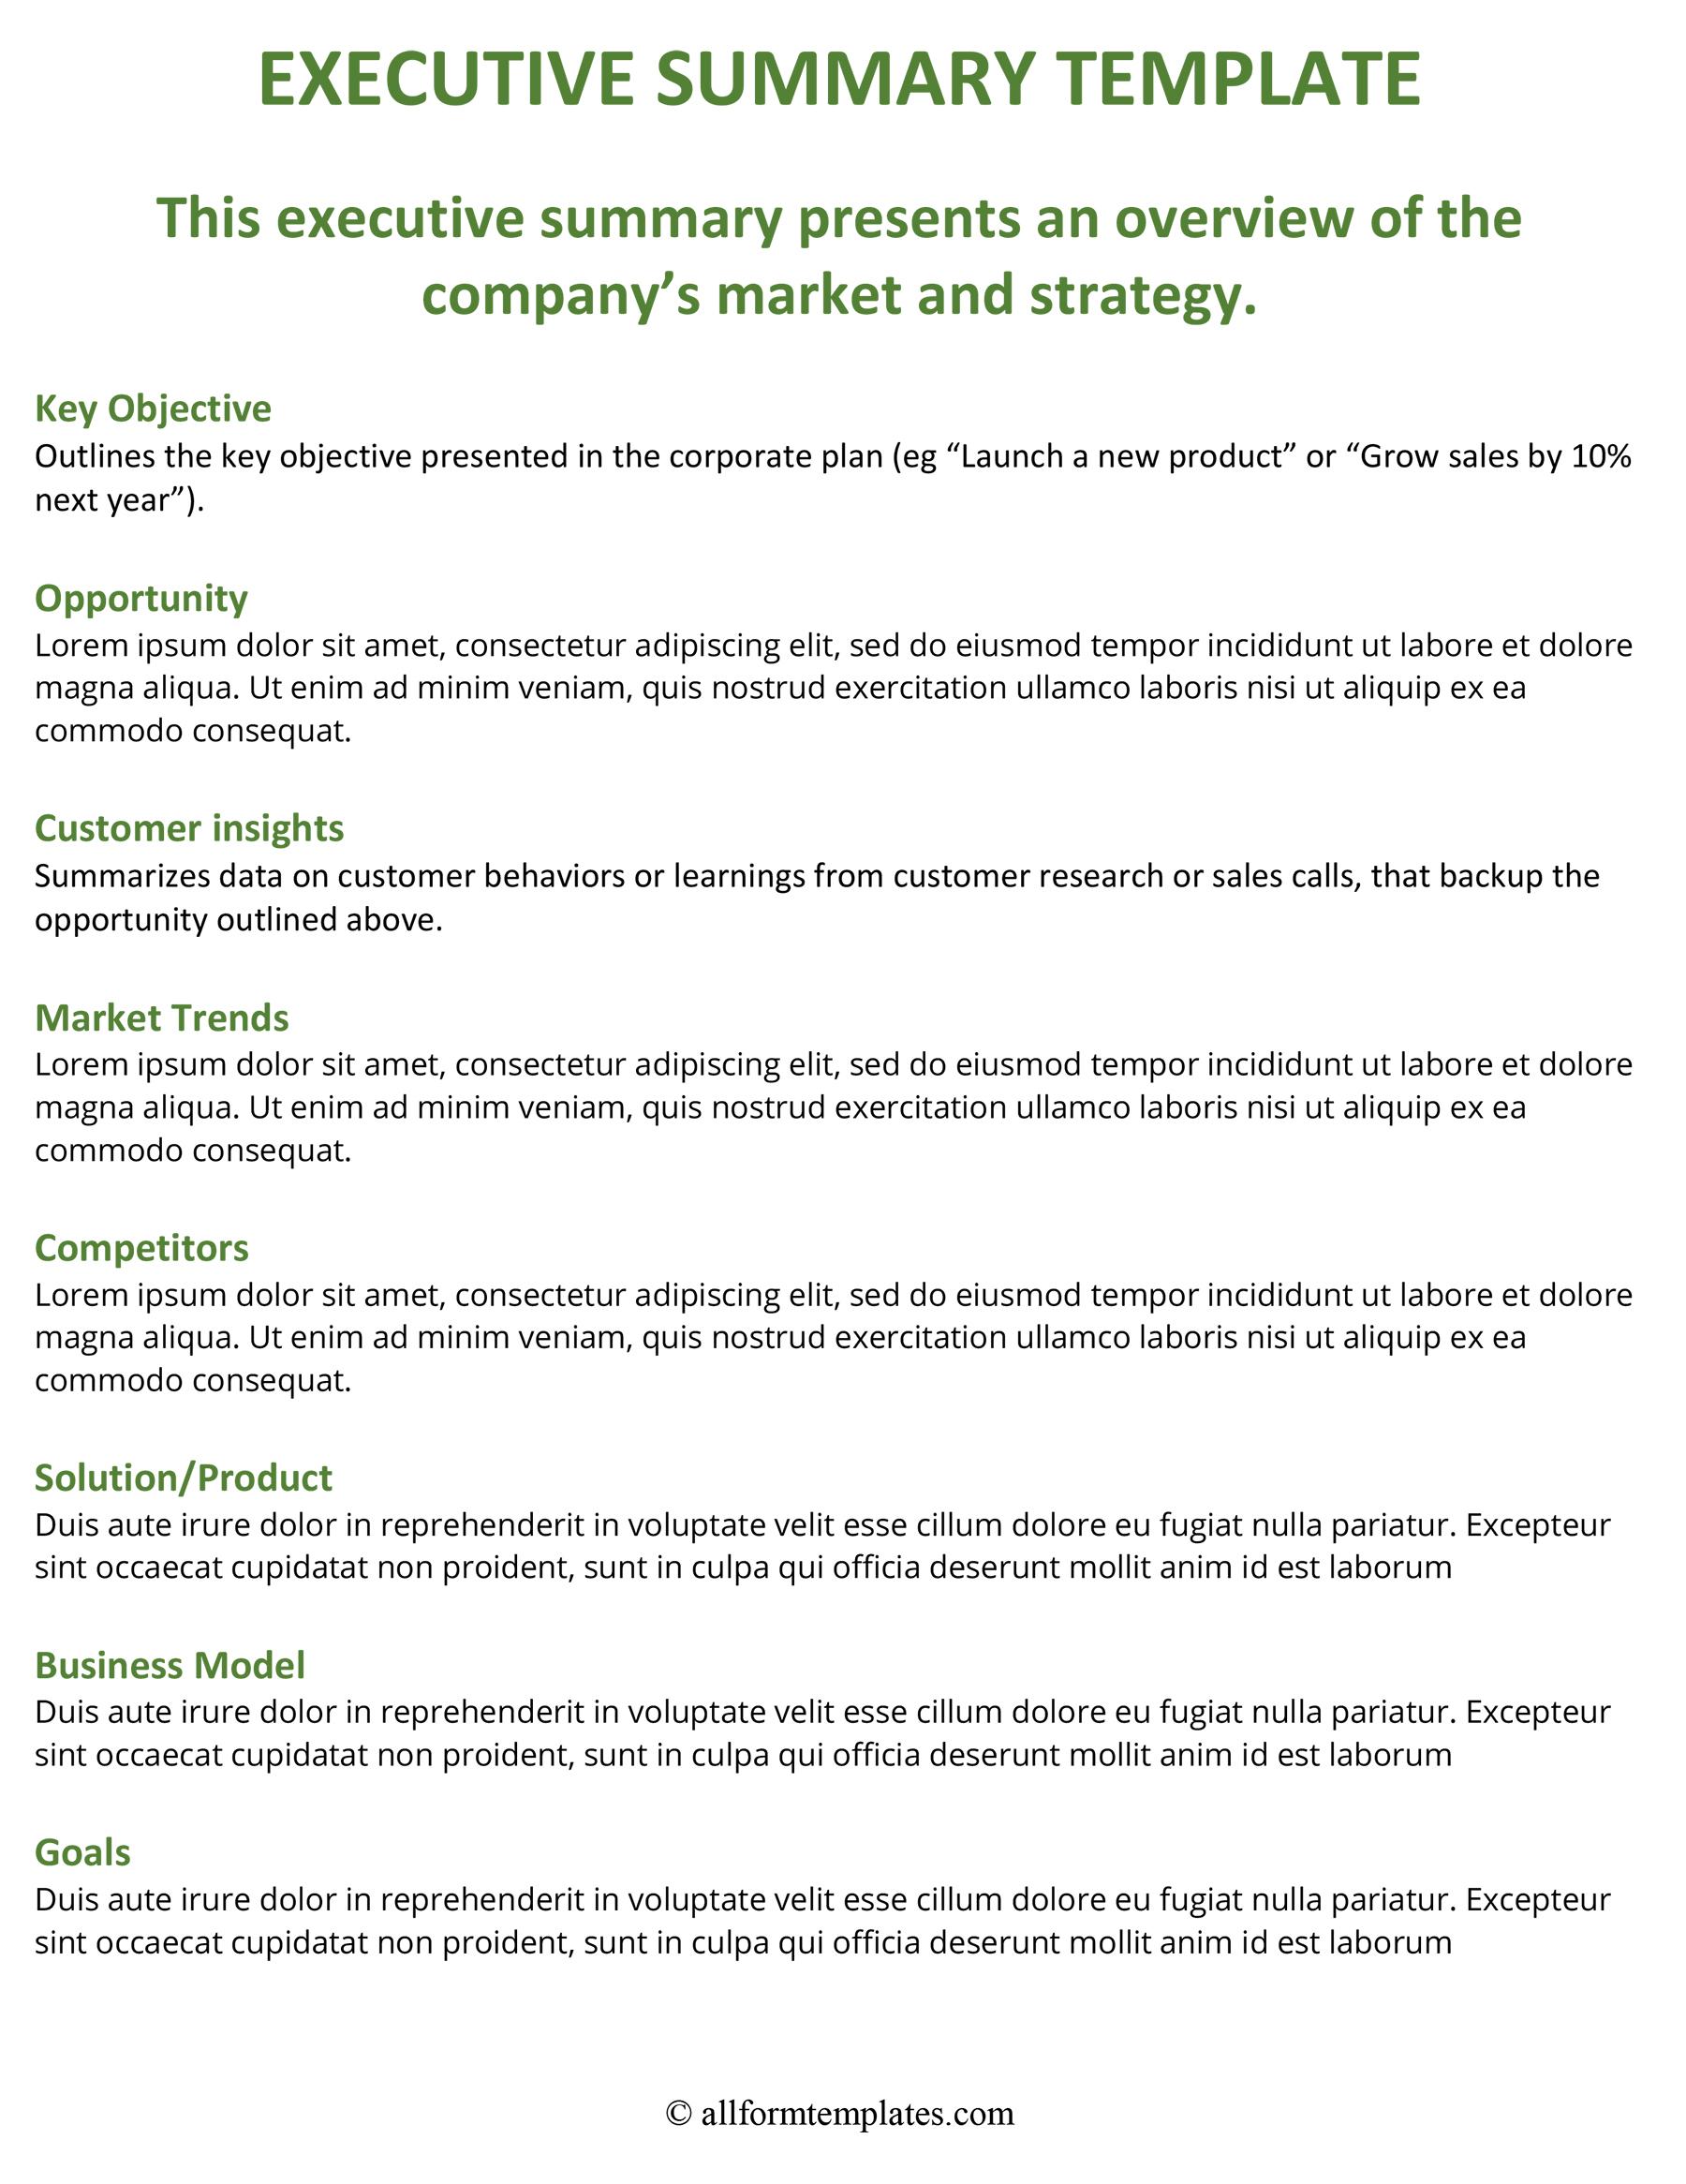 Executive-Summary-Templates-05-HD